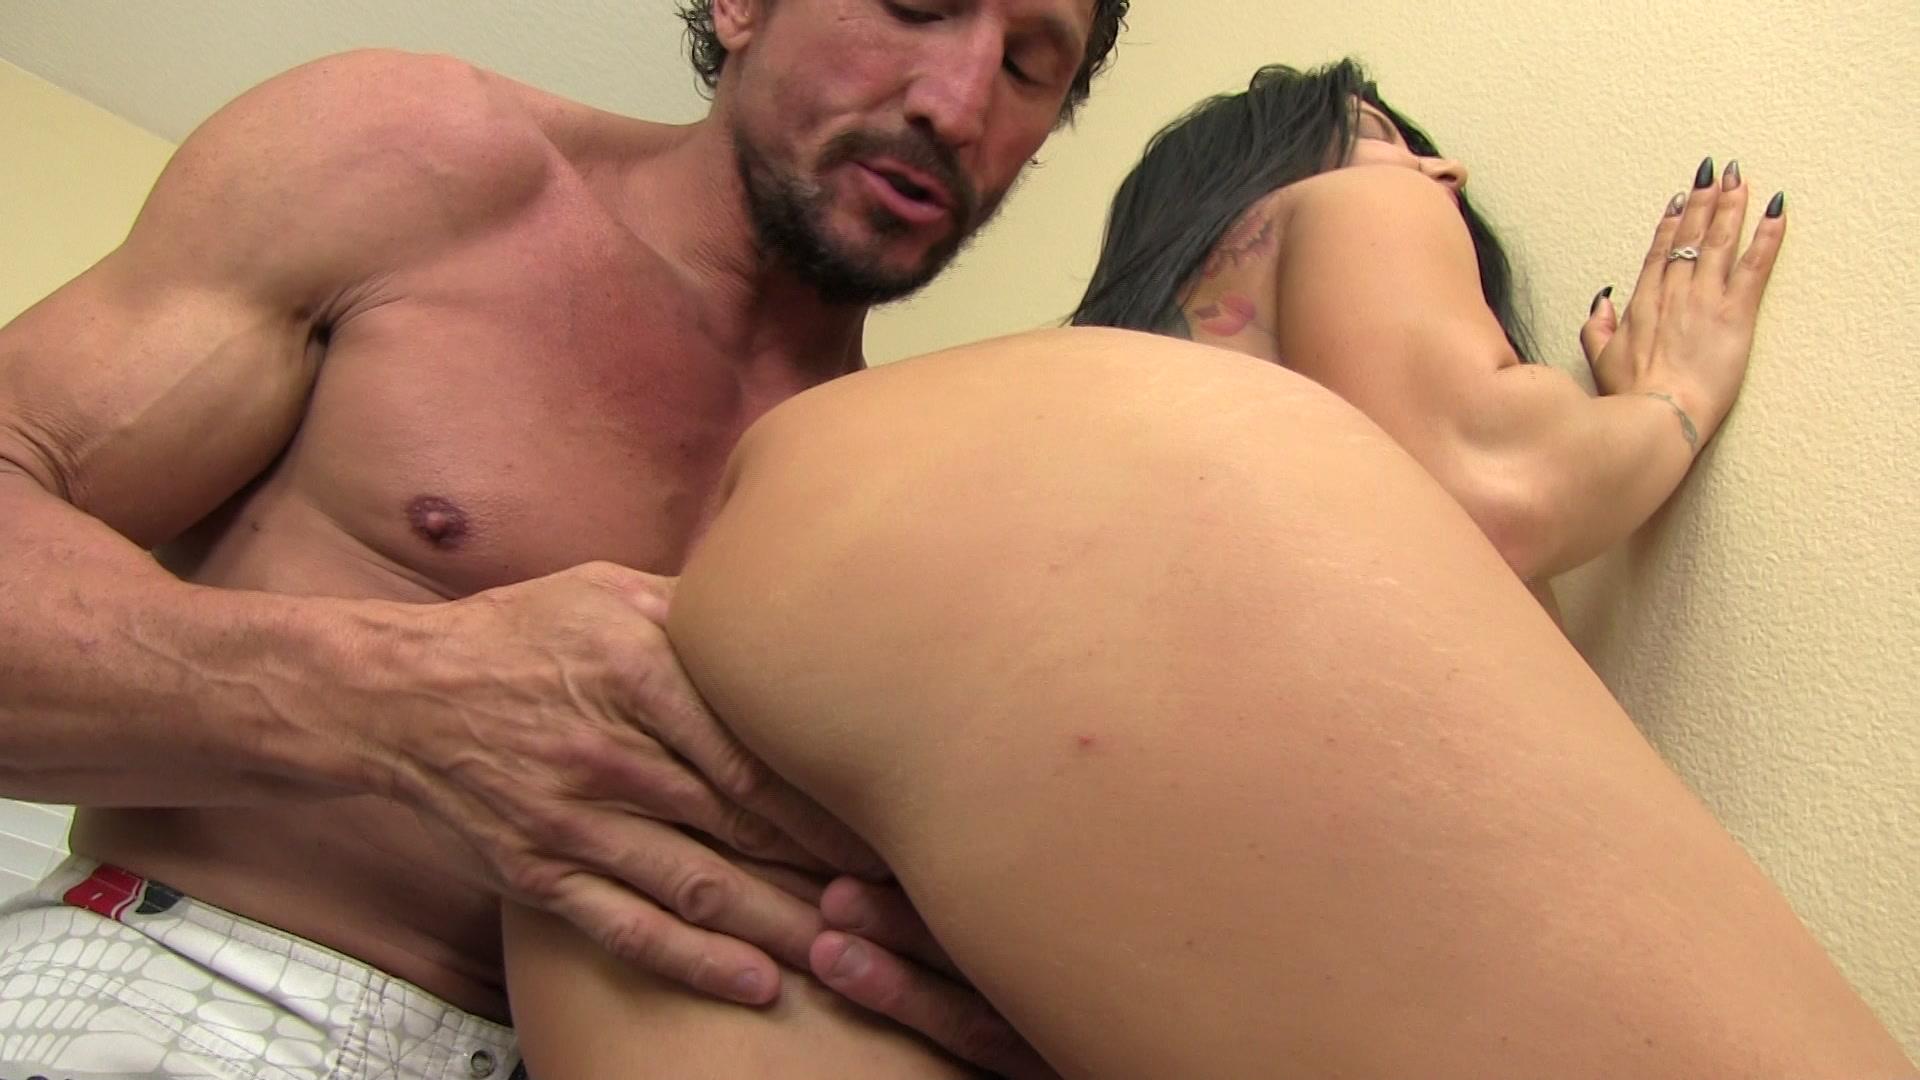 maui taylor hot nude pics